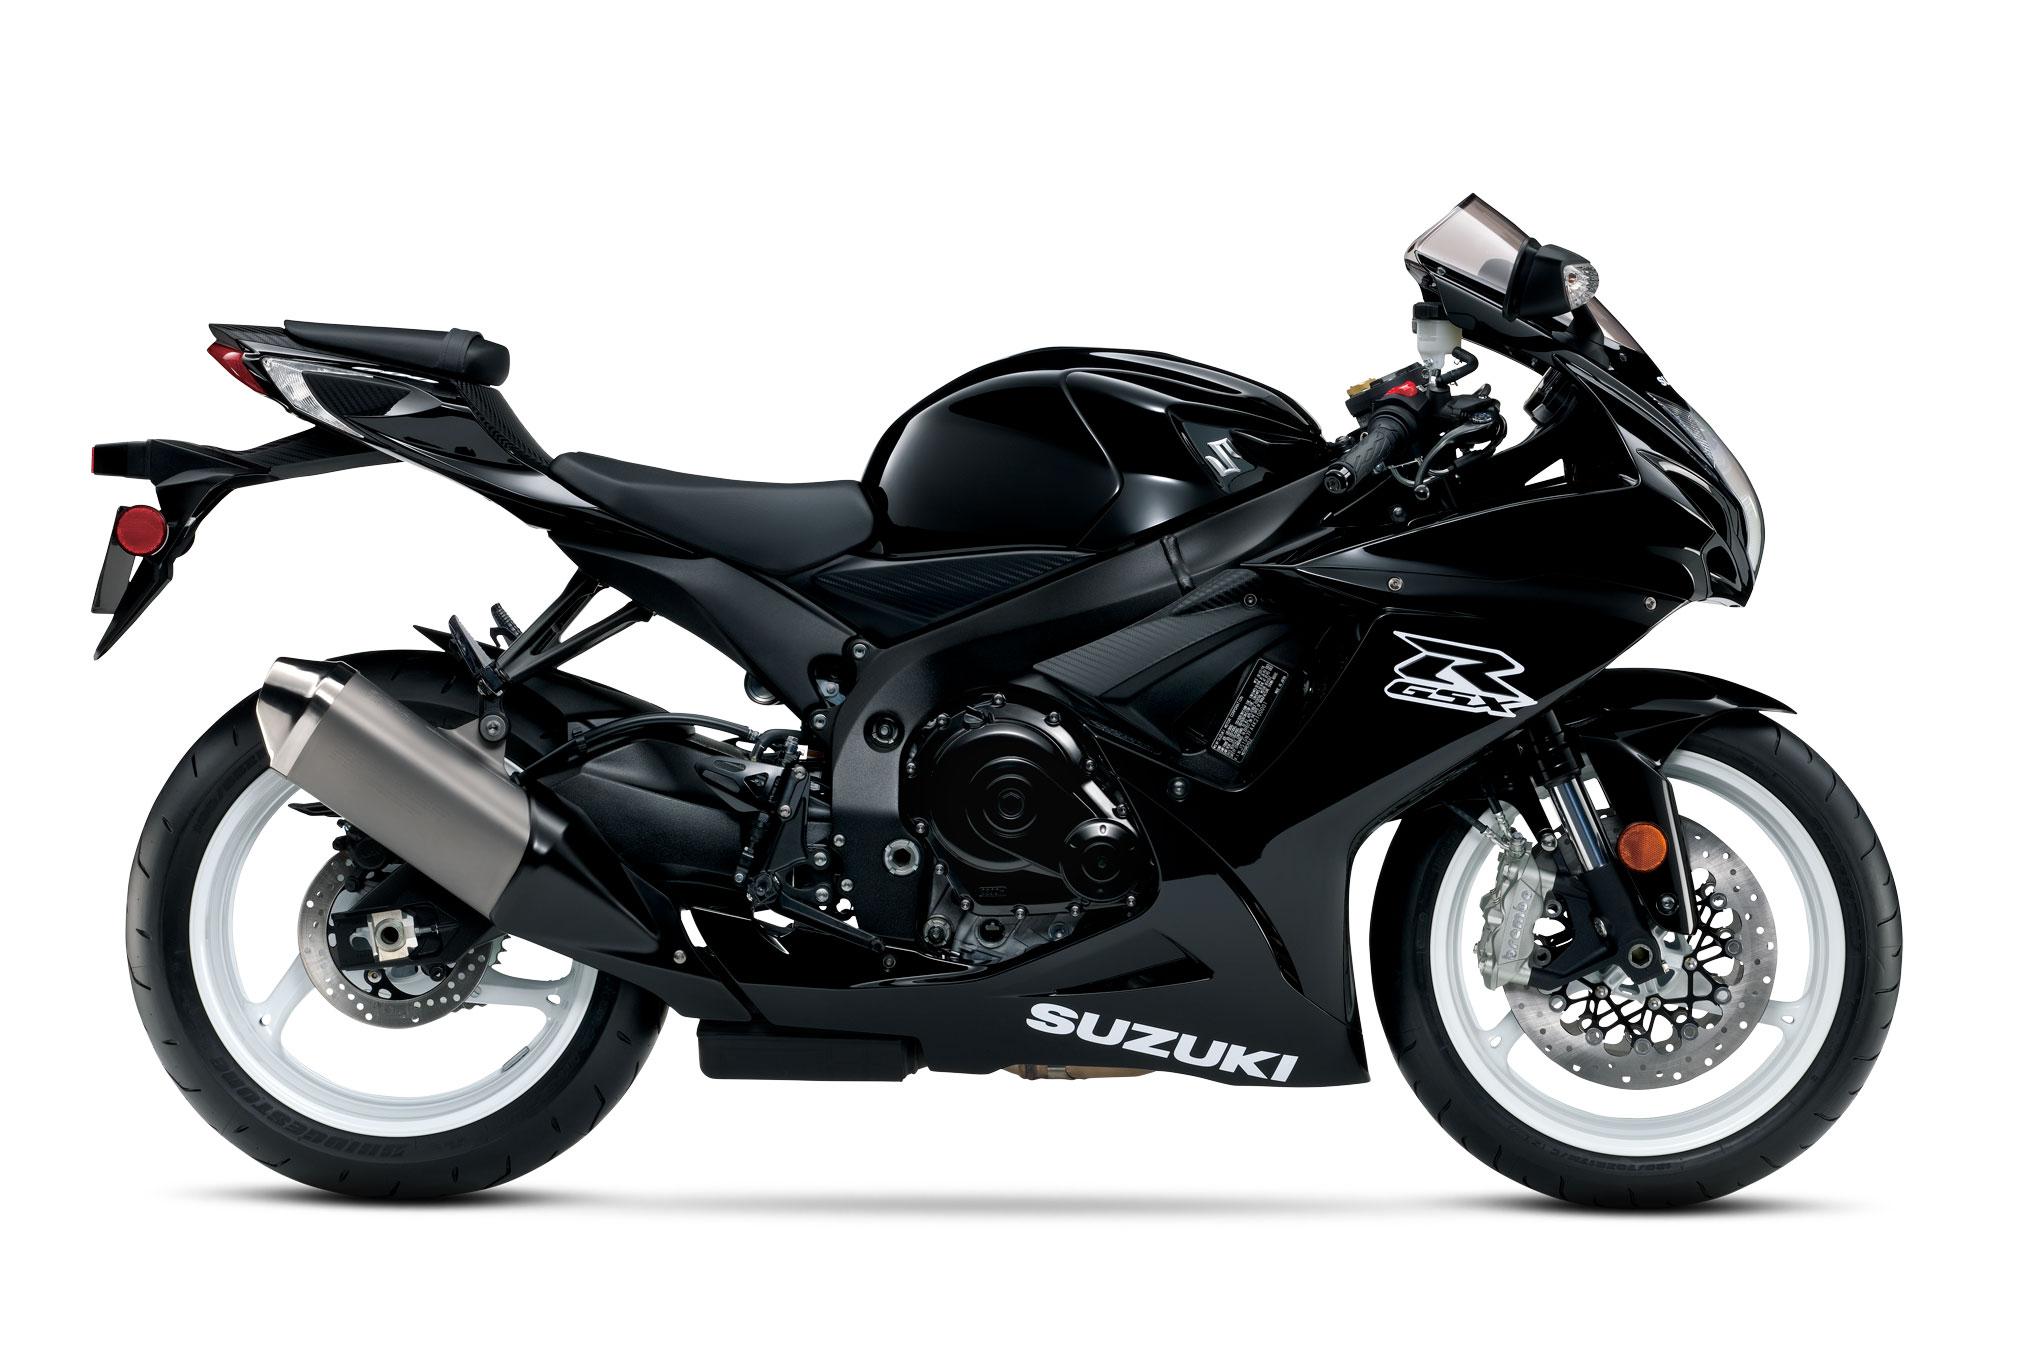 موتورسیکلت سوزوکی 2020 GSX-R600